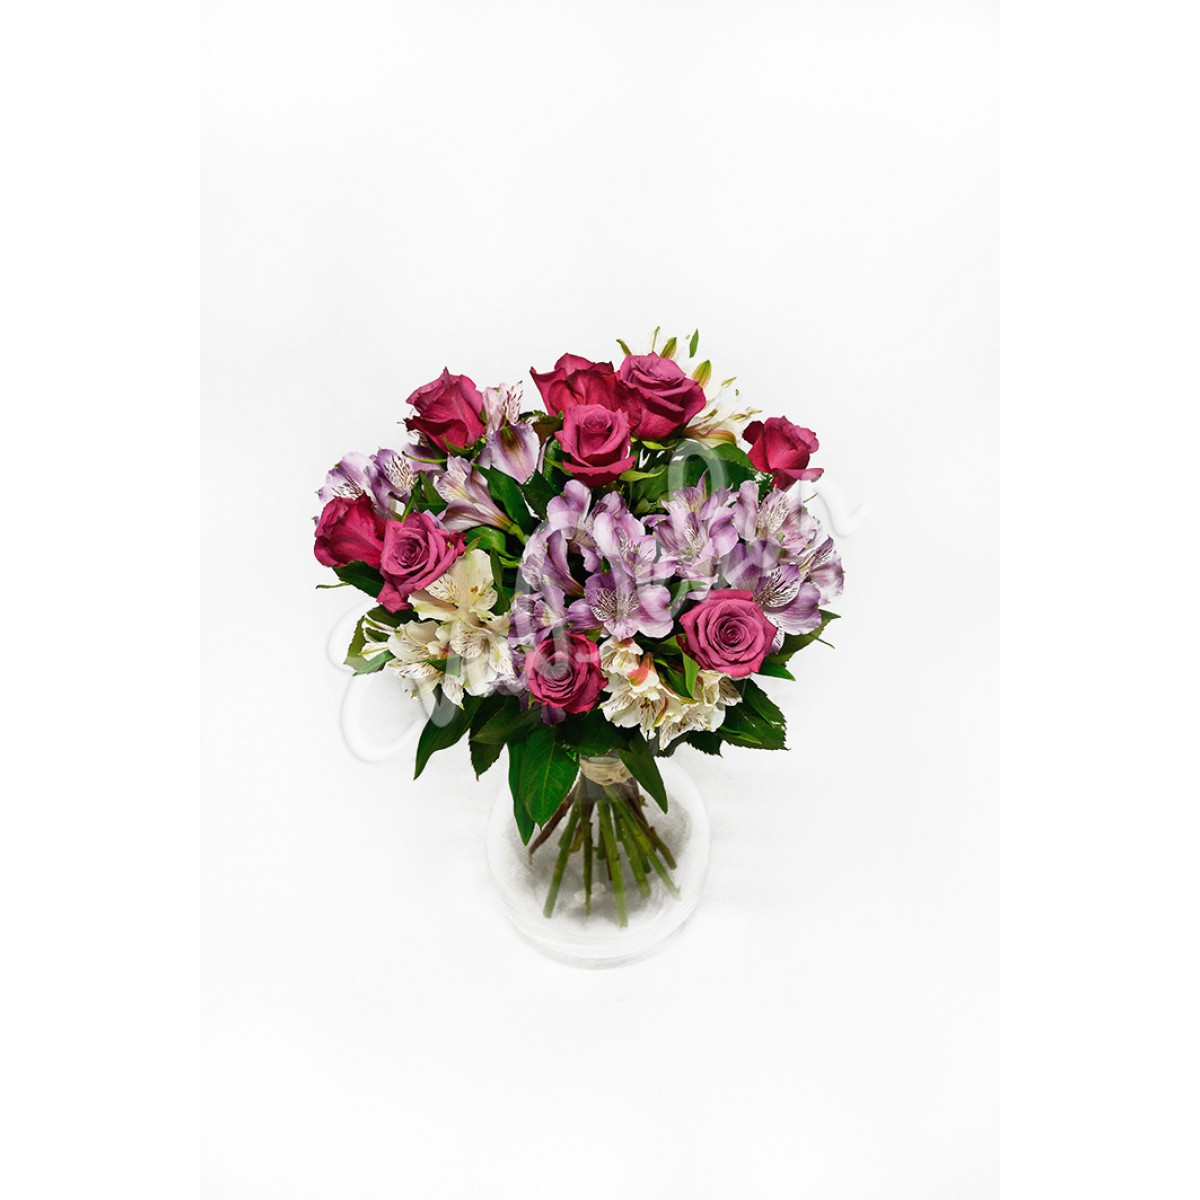 Alstroemerie a růže - Evadekor.cz rozvoz květin